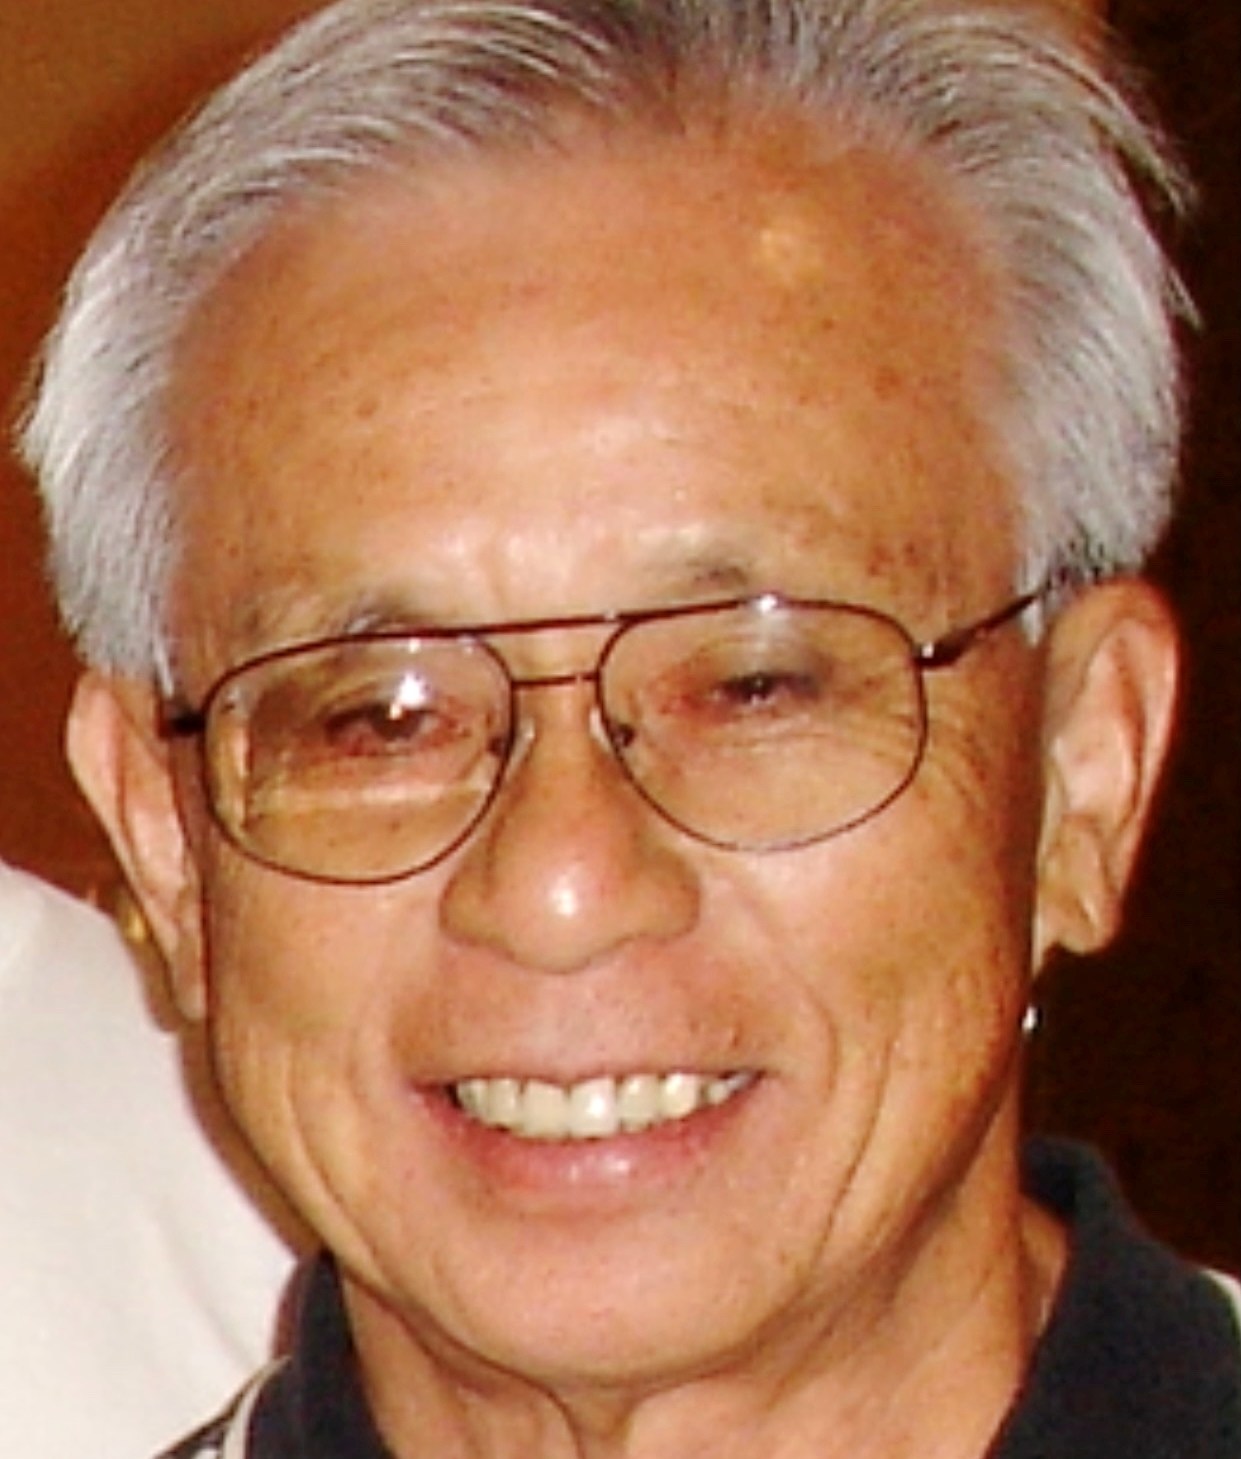 THOMAS SHIRO ARAKI